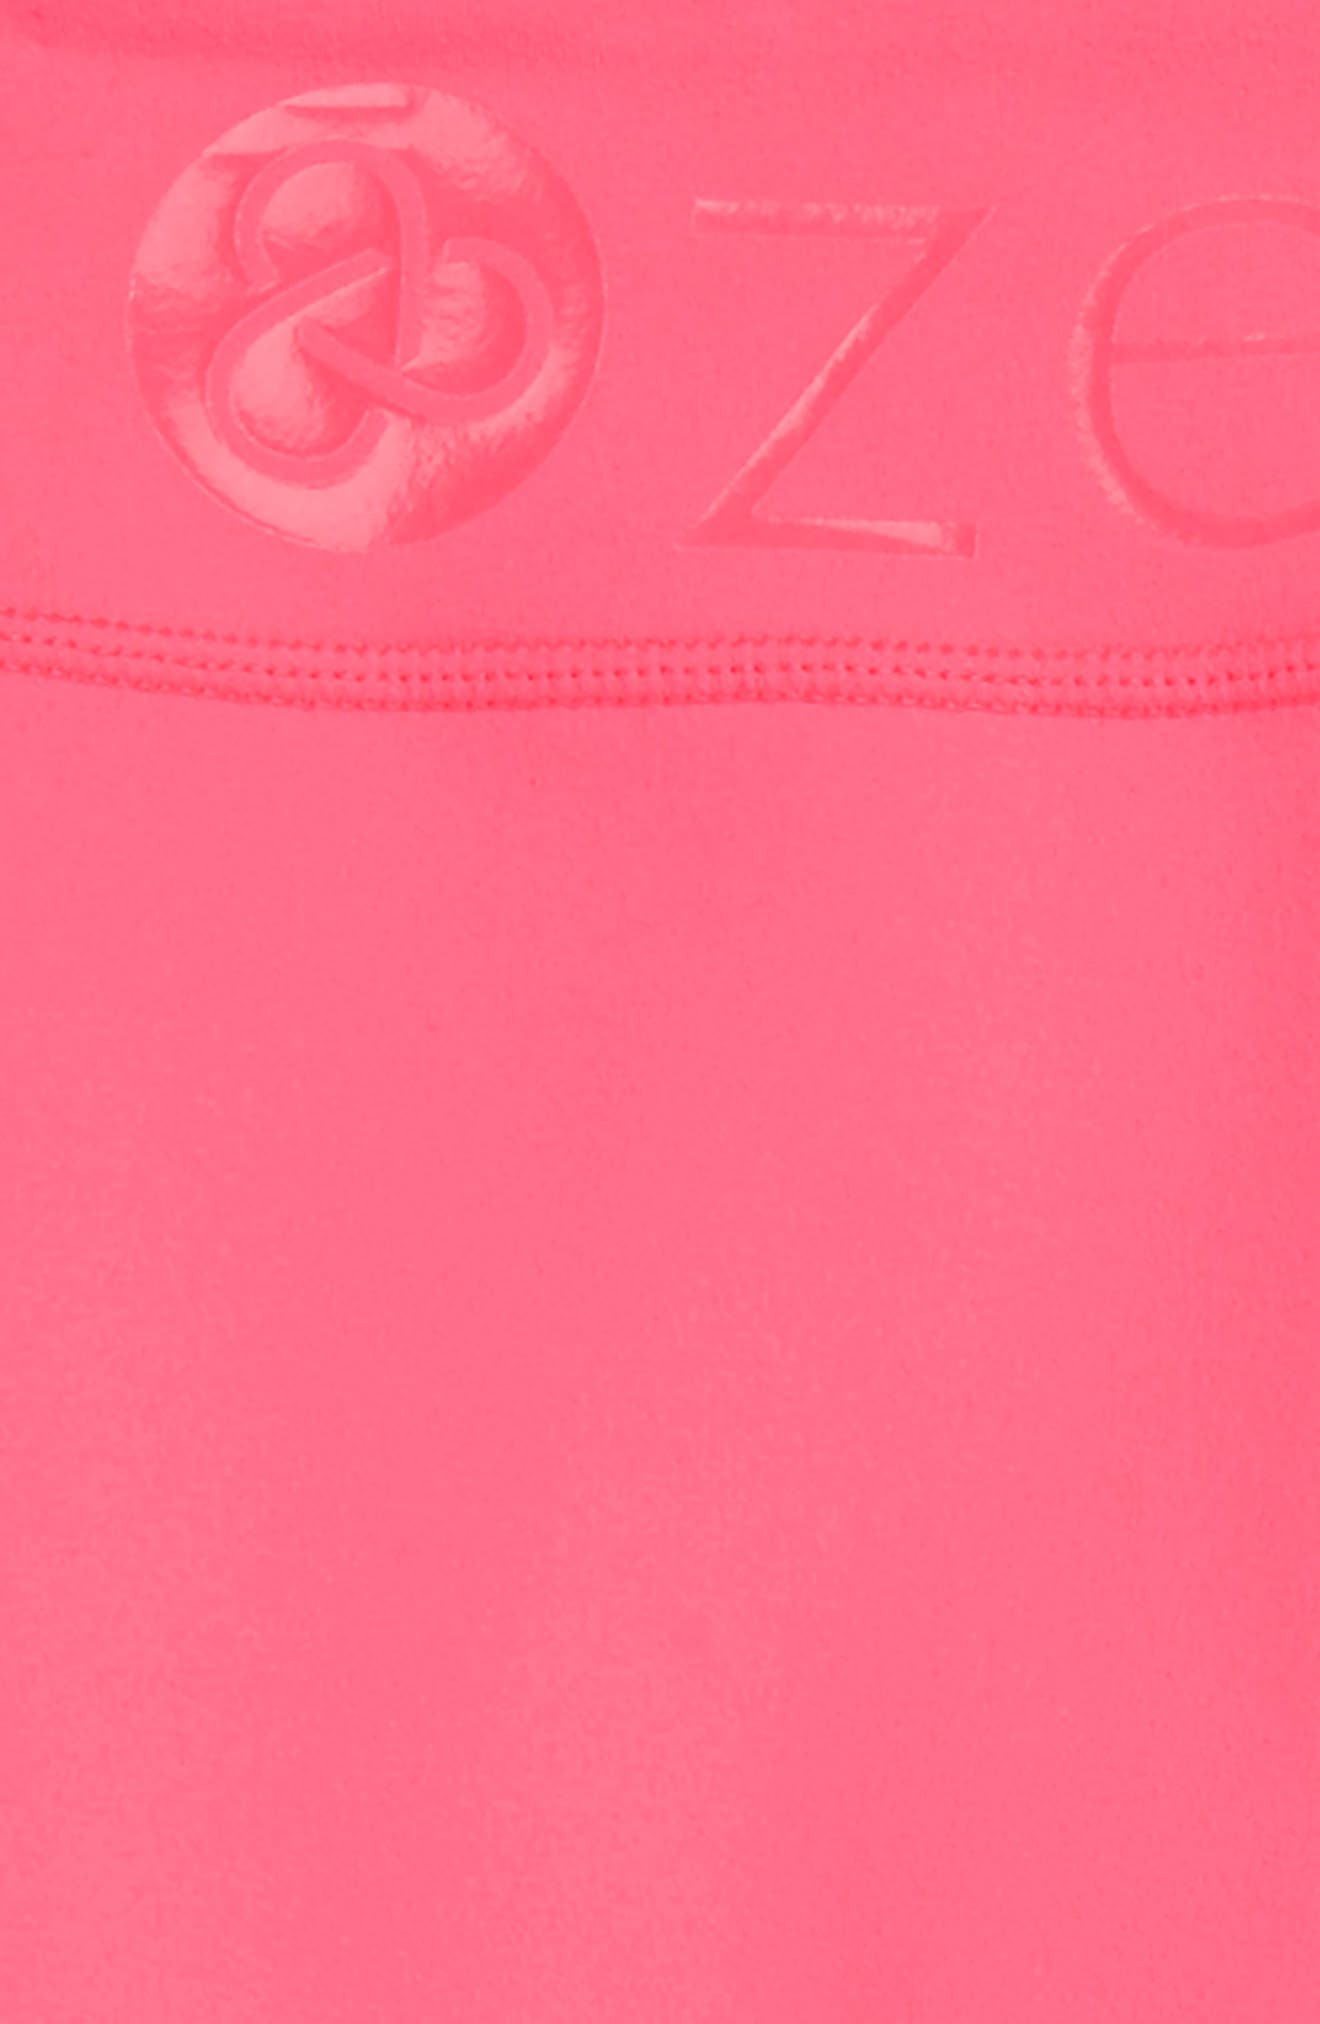 High Waist Leggings,                             Alternate thumbnail 2, color,                             Pink Neon